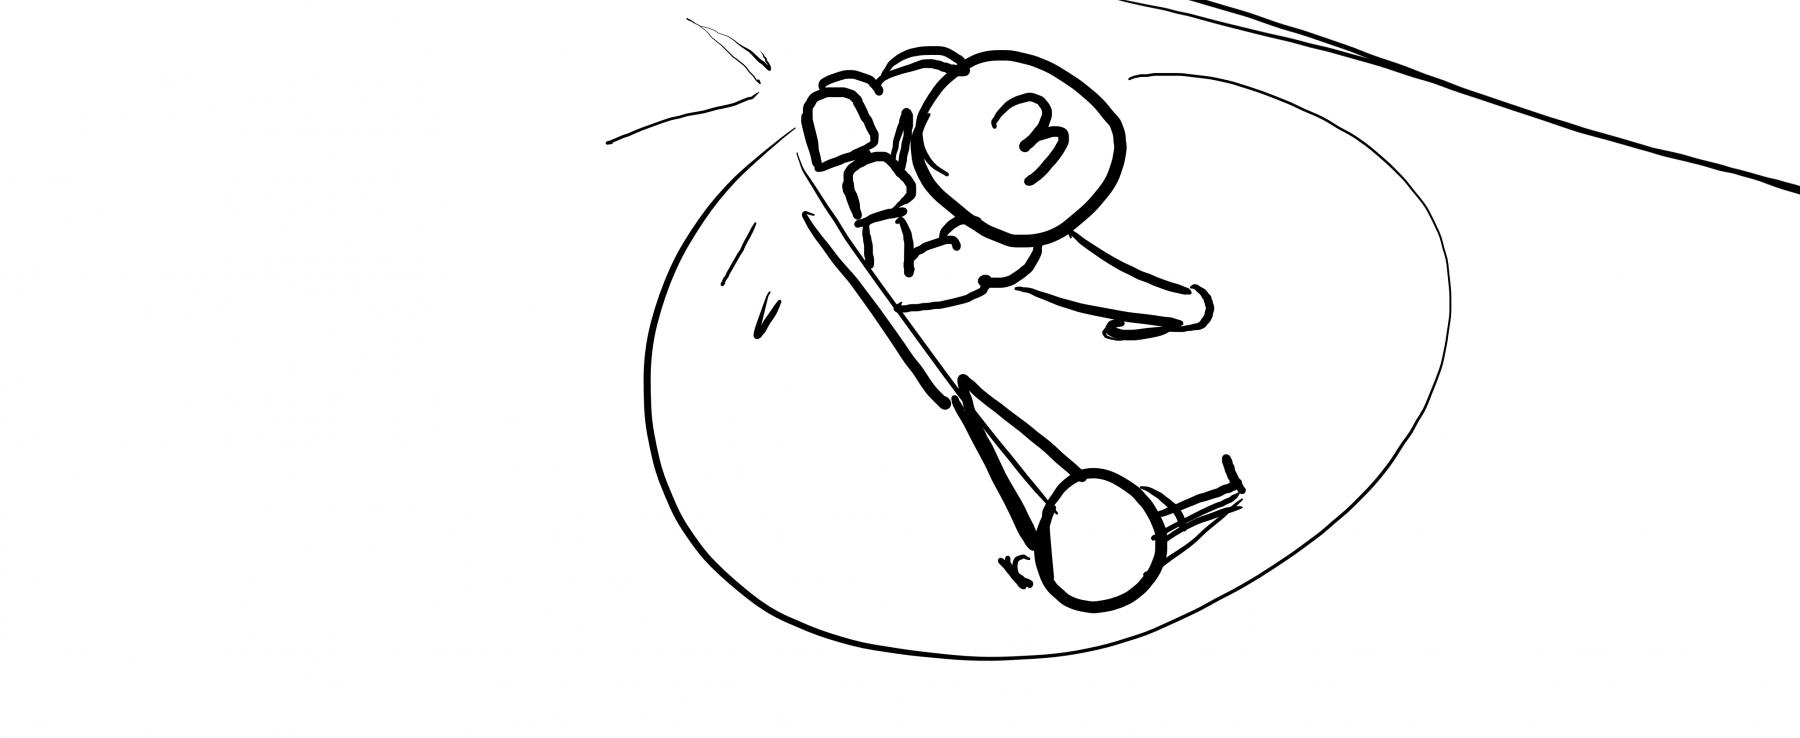 Nut-Thumbnail-Rough-Board00267